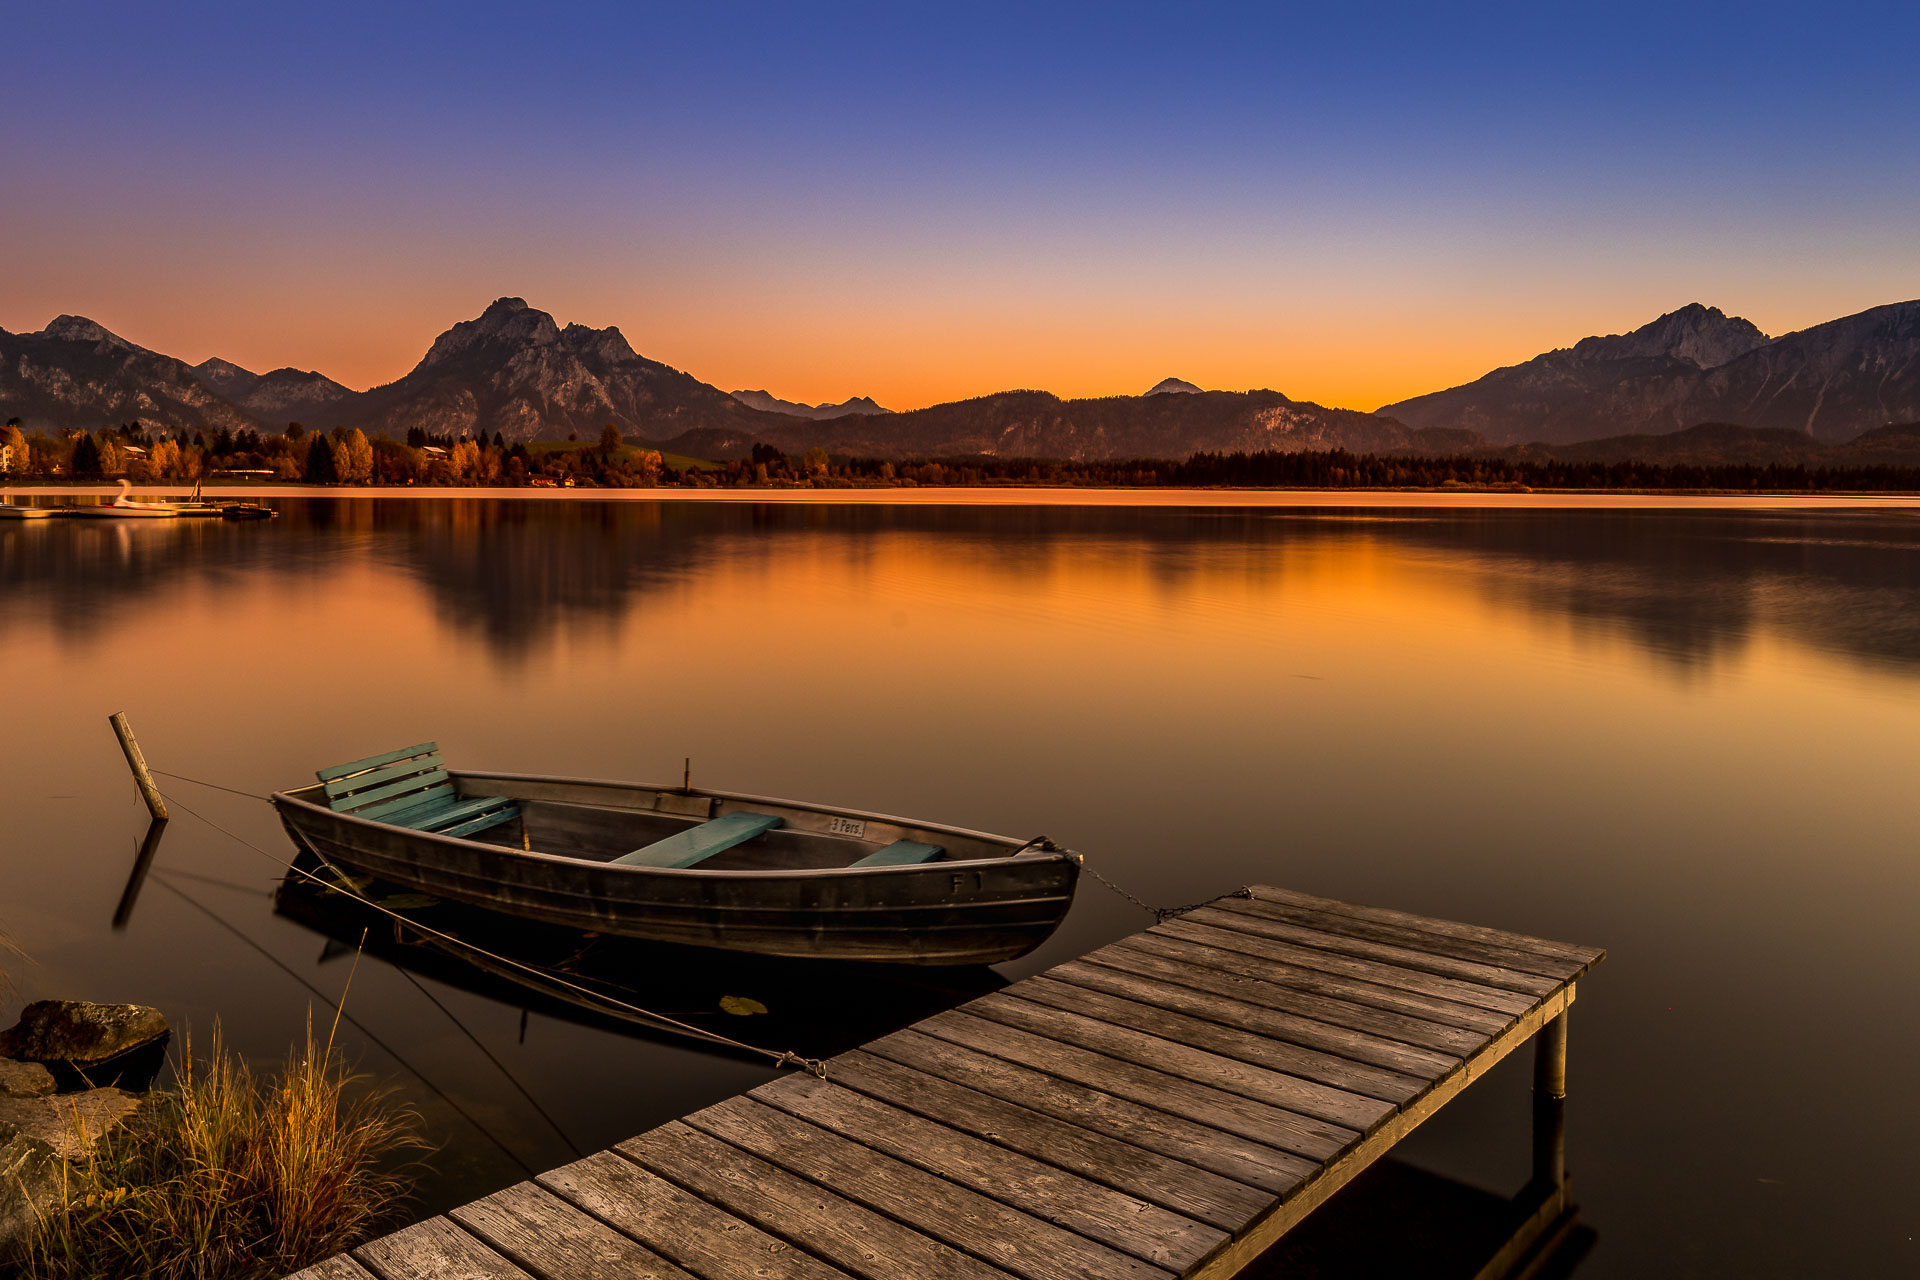 Das Boot am Hopfensee fotografiert in Richtung bayerischer Alpen bei Füssen